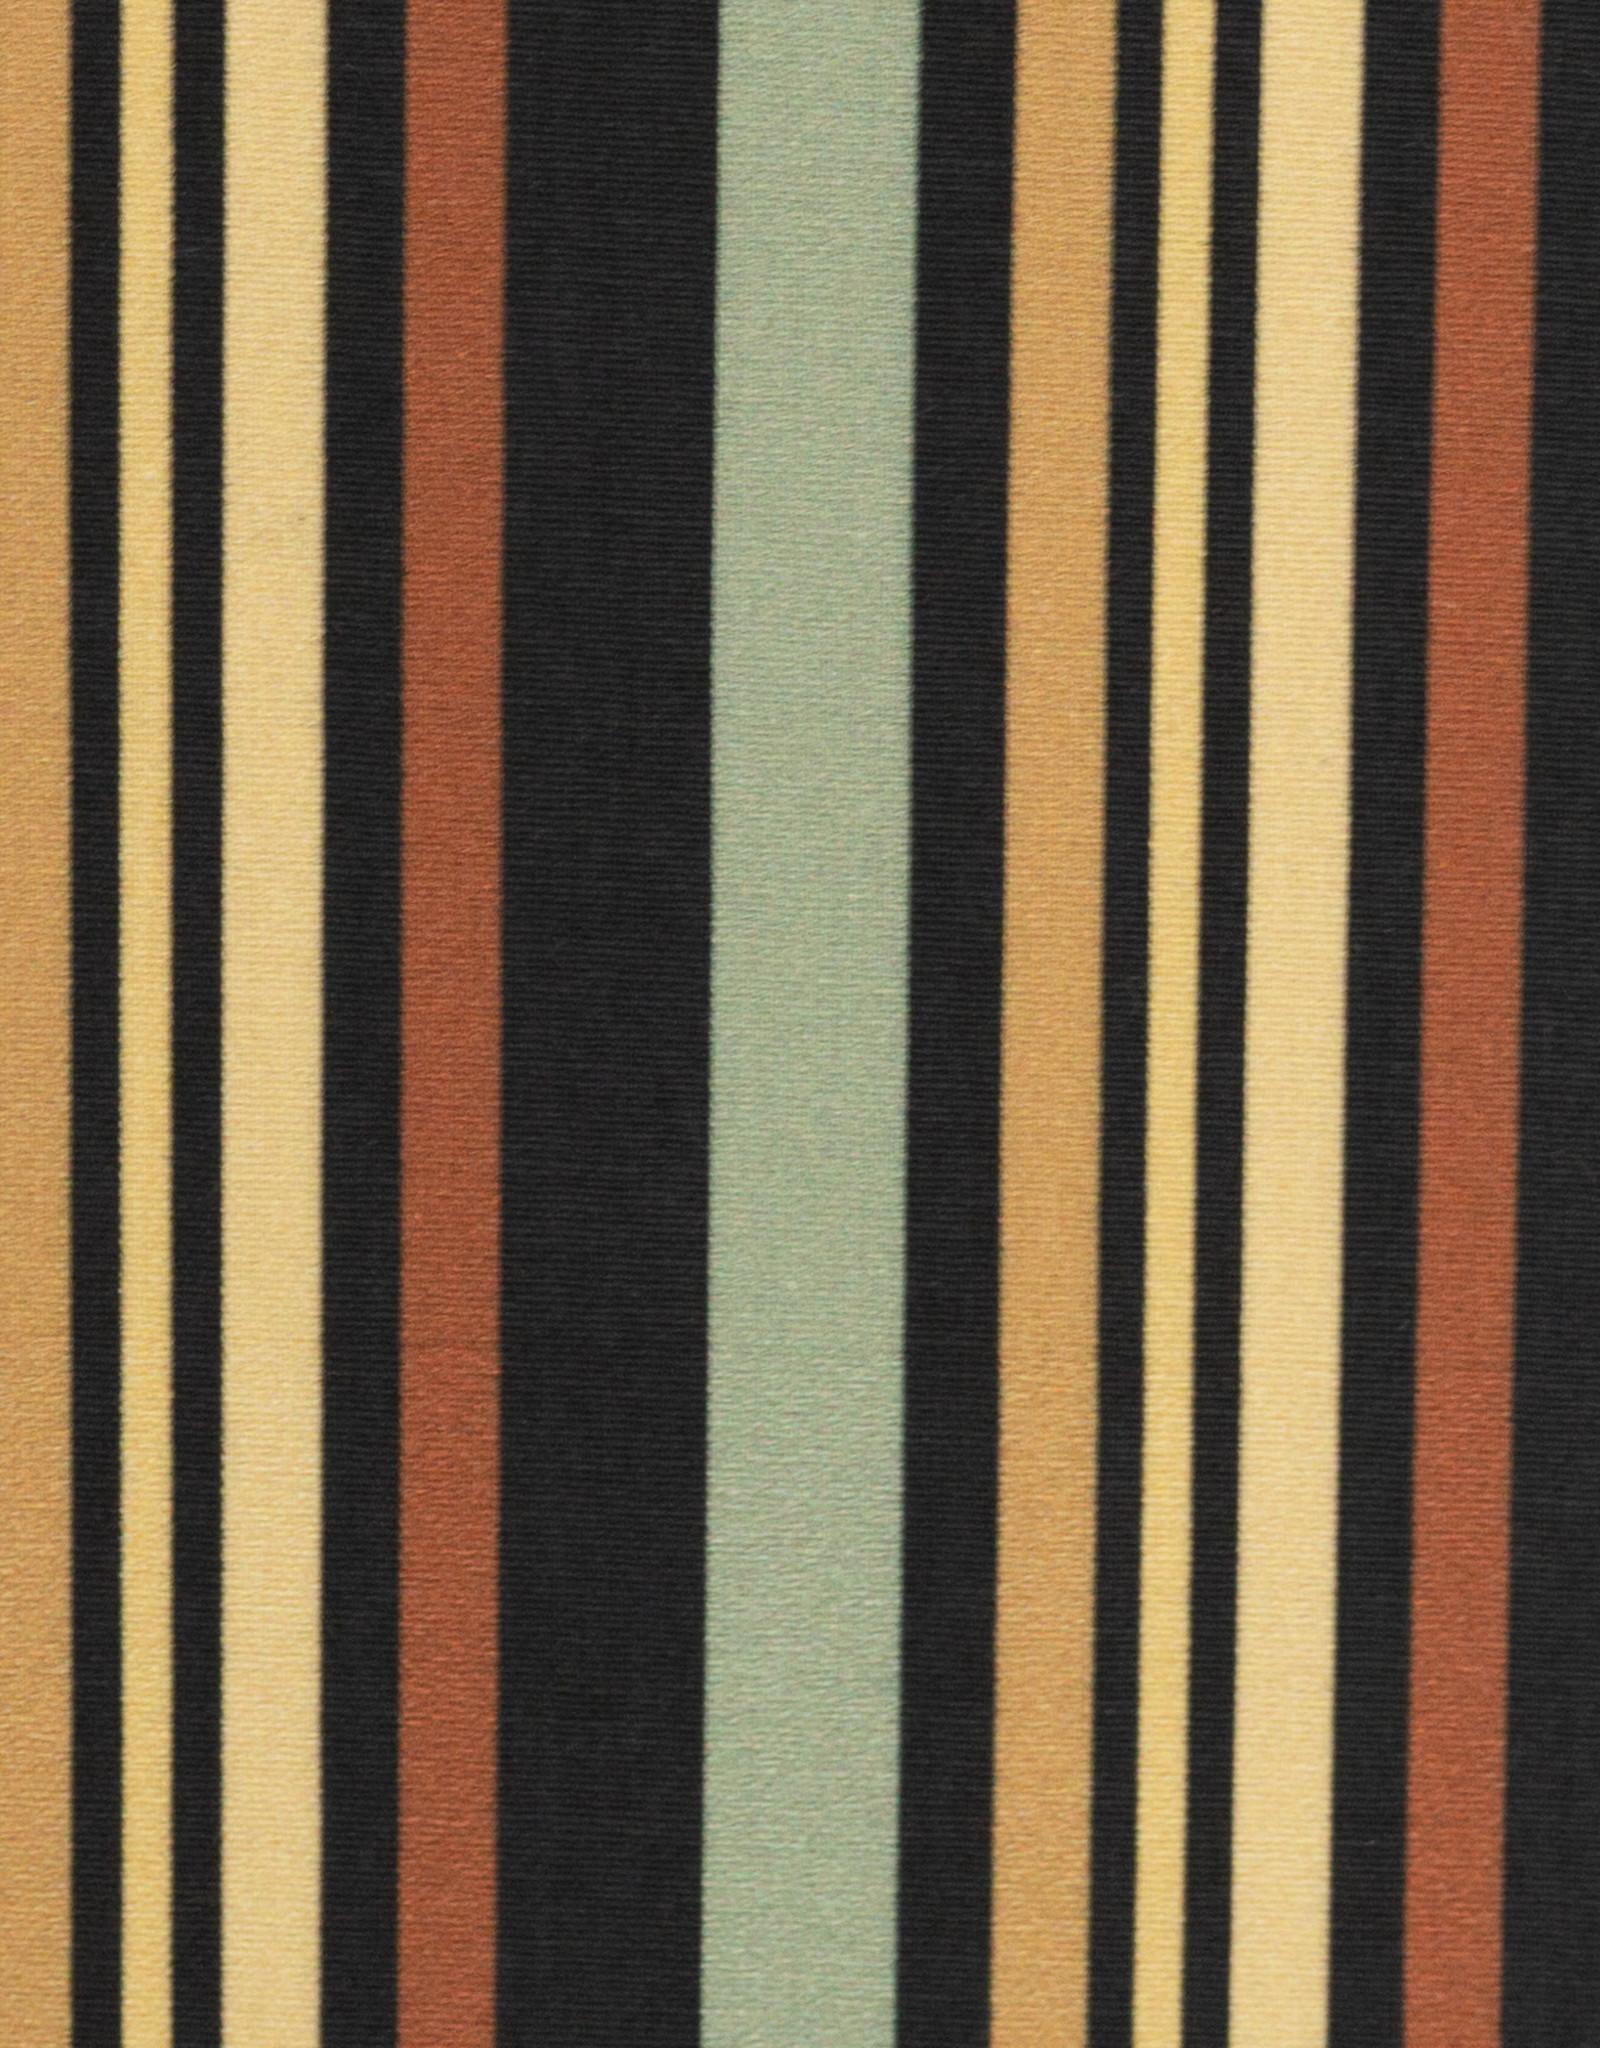 Katoen - Stripes Autumn